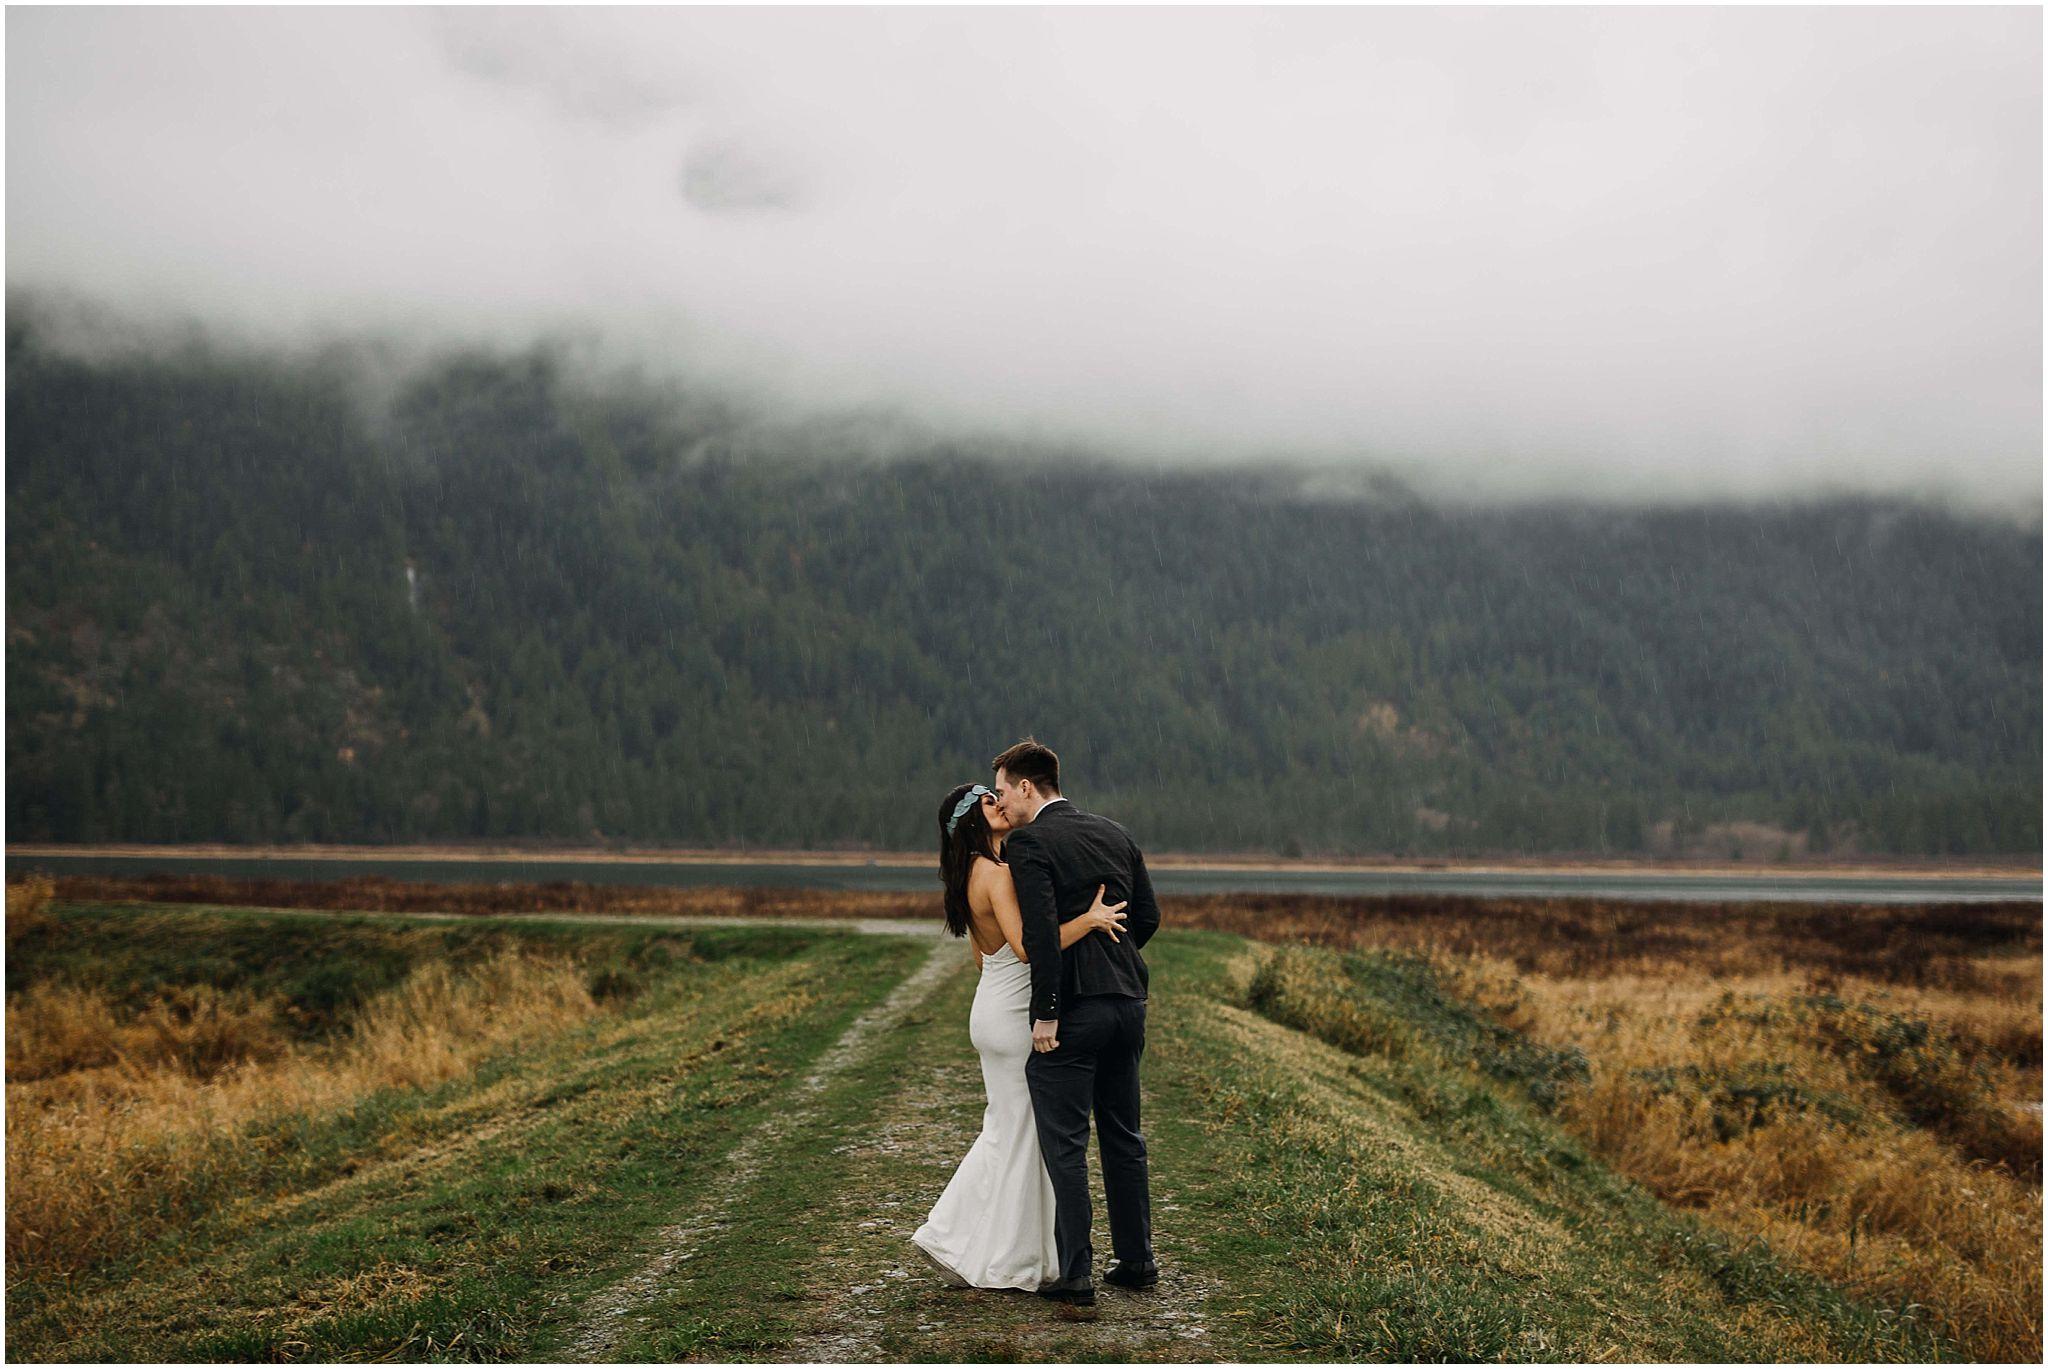 bride groom kiss pitt lake marsh foggy pnw